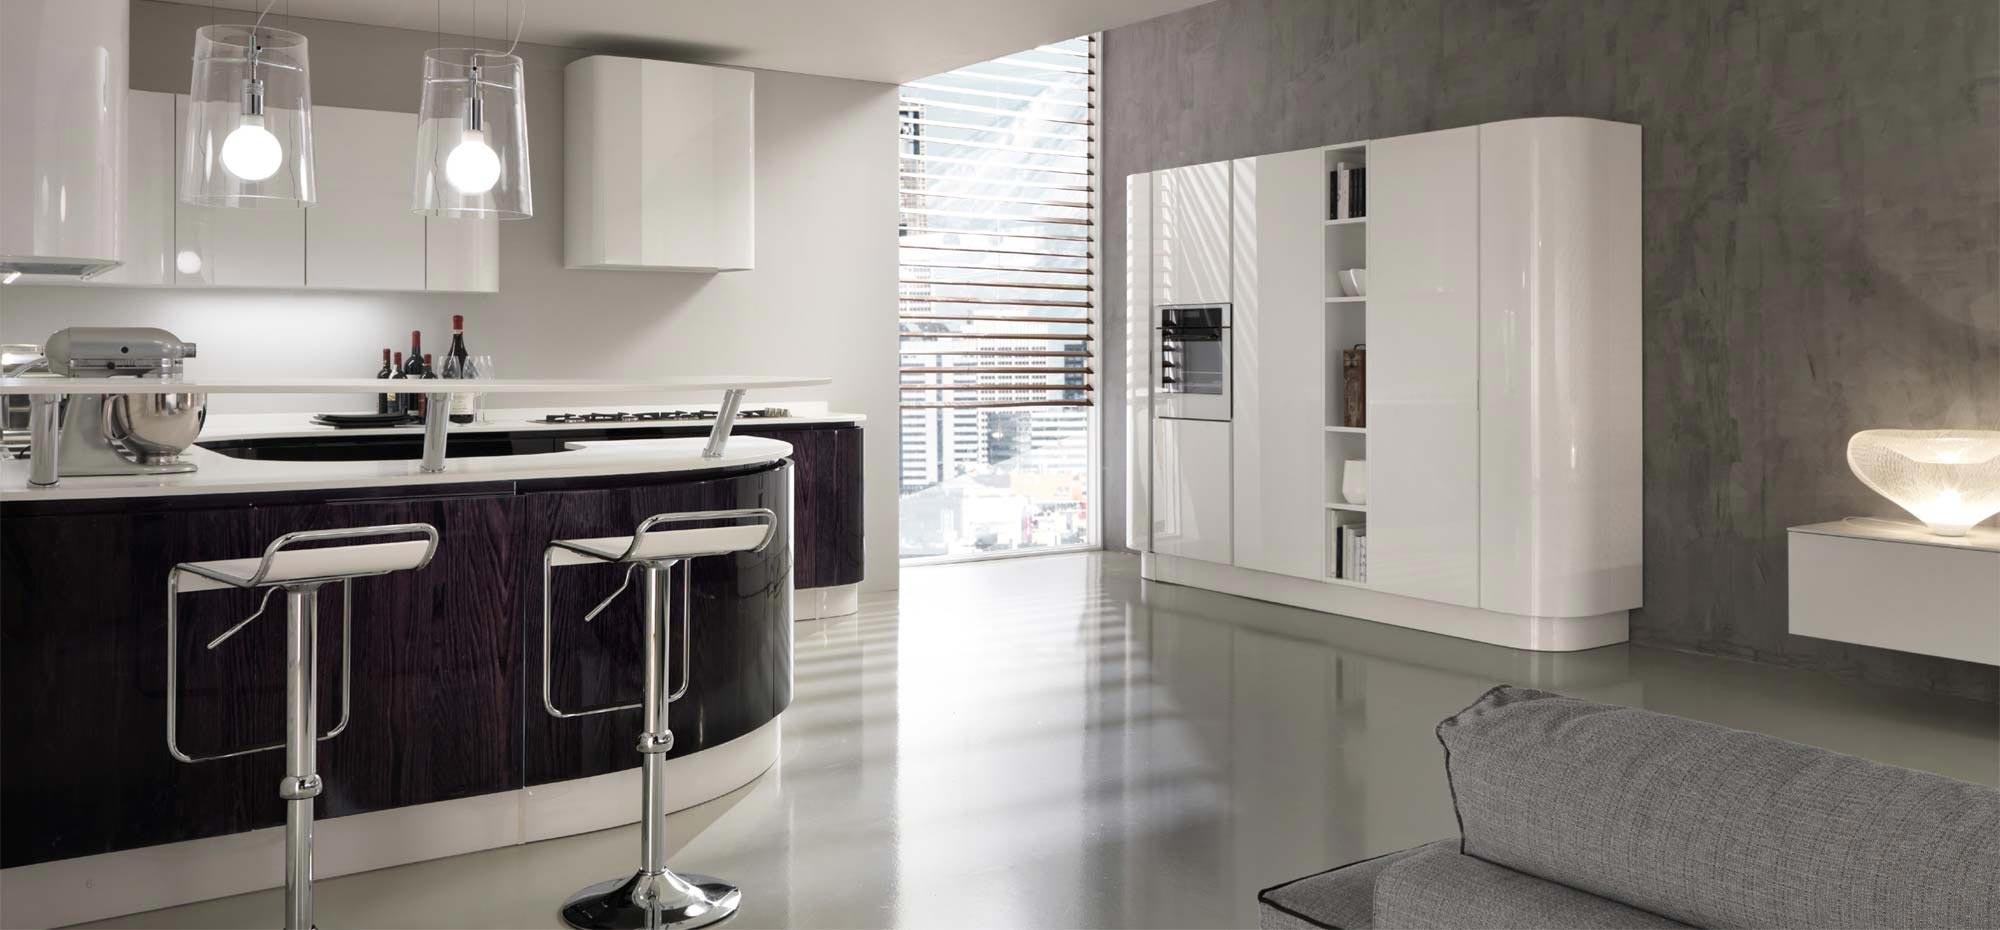 Tiarch.com  Cucine 3 Metri Napoli